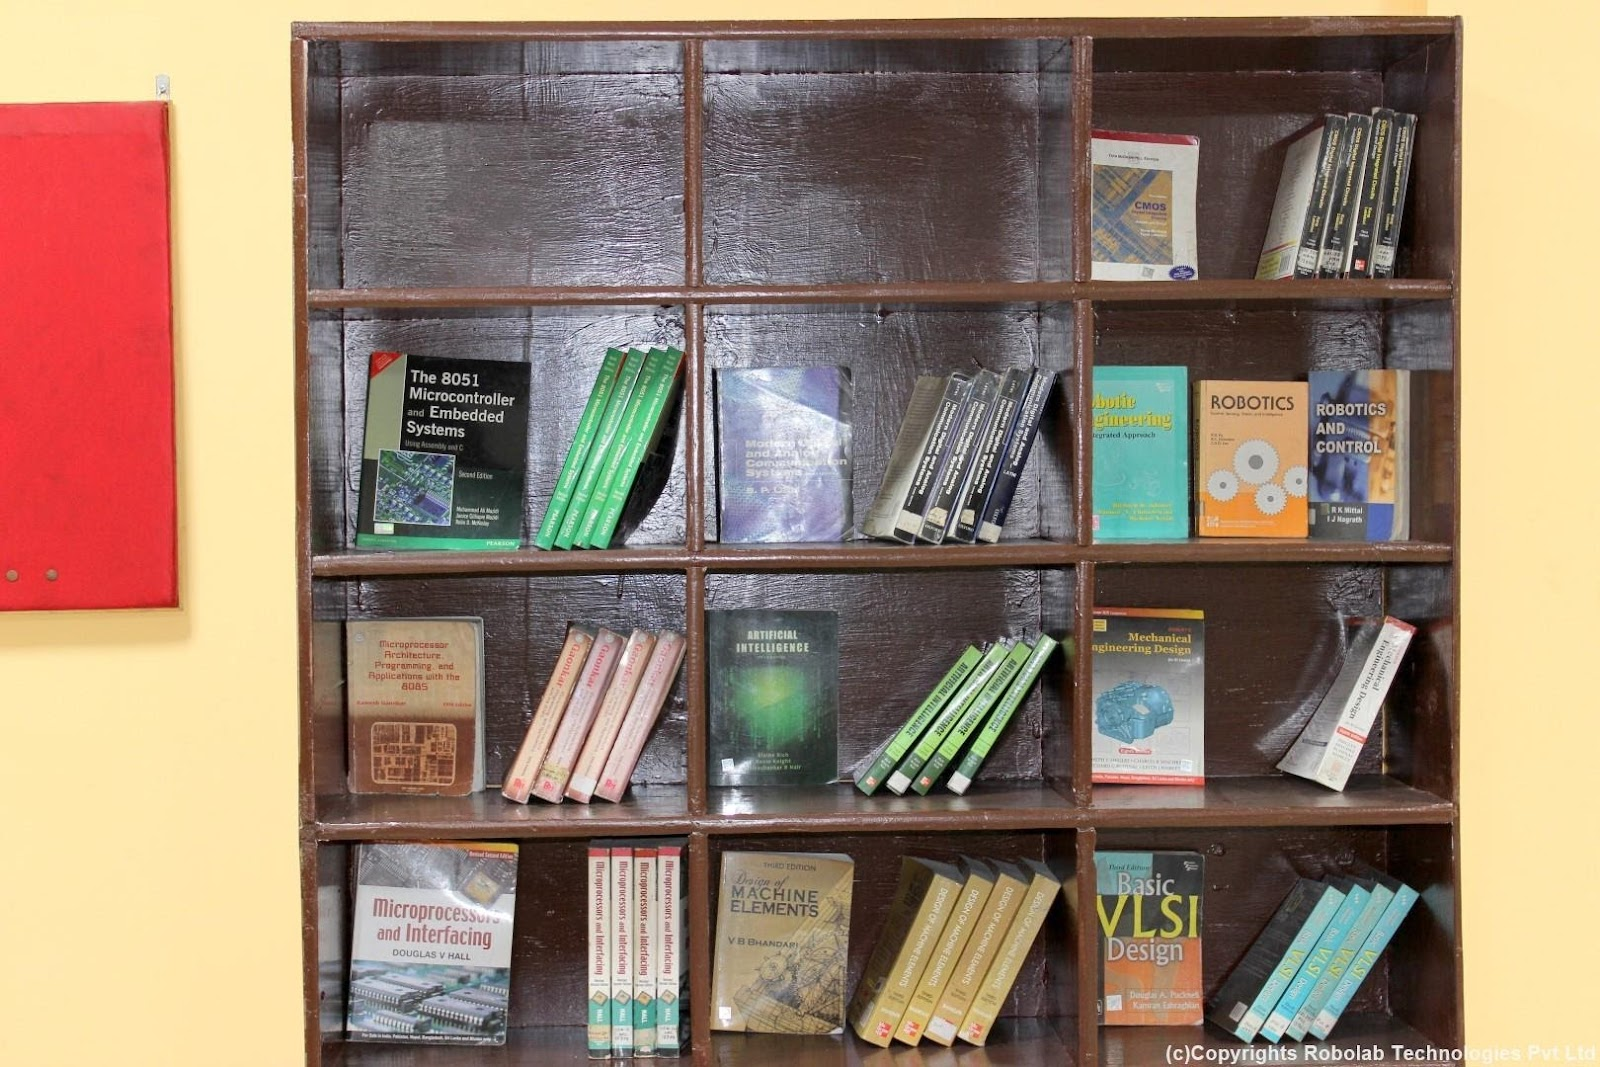 SunderDeep Group of Institutions, Ghaziabad Robolab (9).jpg